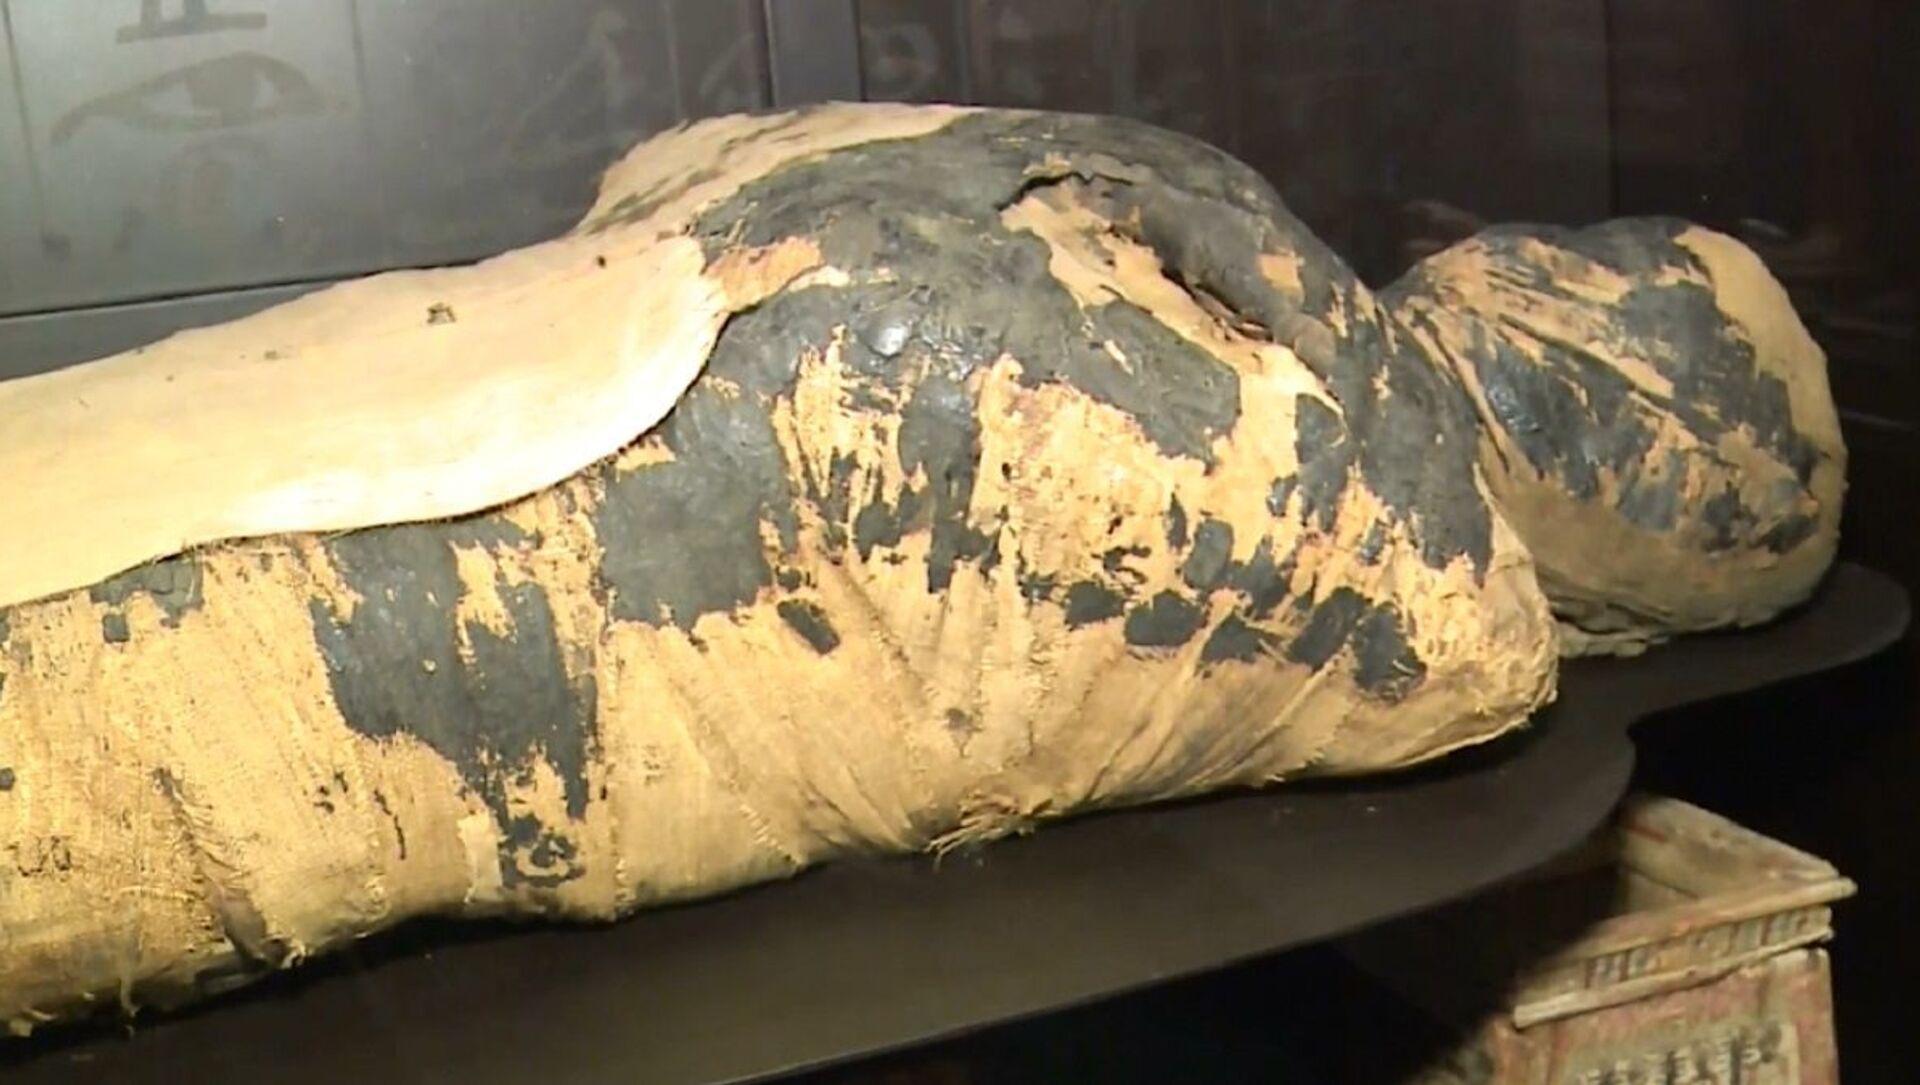 Mummia egiziana incinta - Sputnik Italia, 1920, 06.05.2021